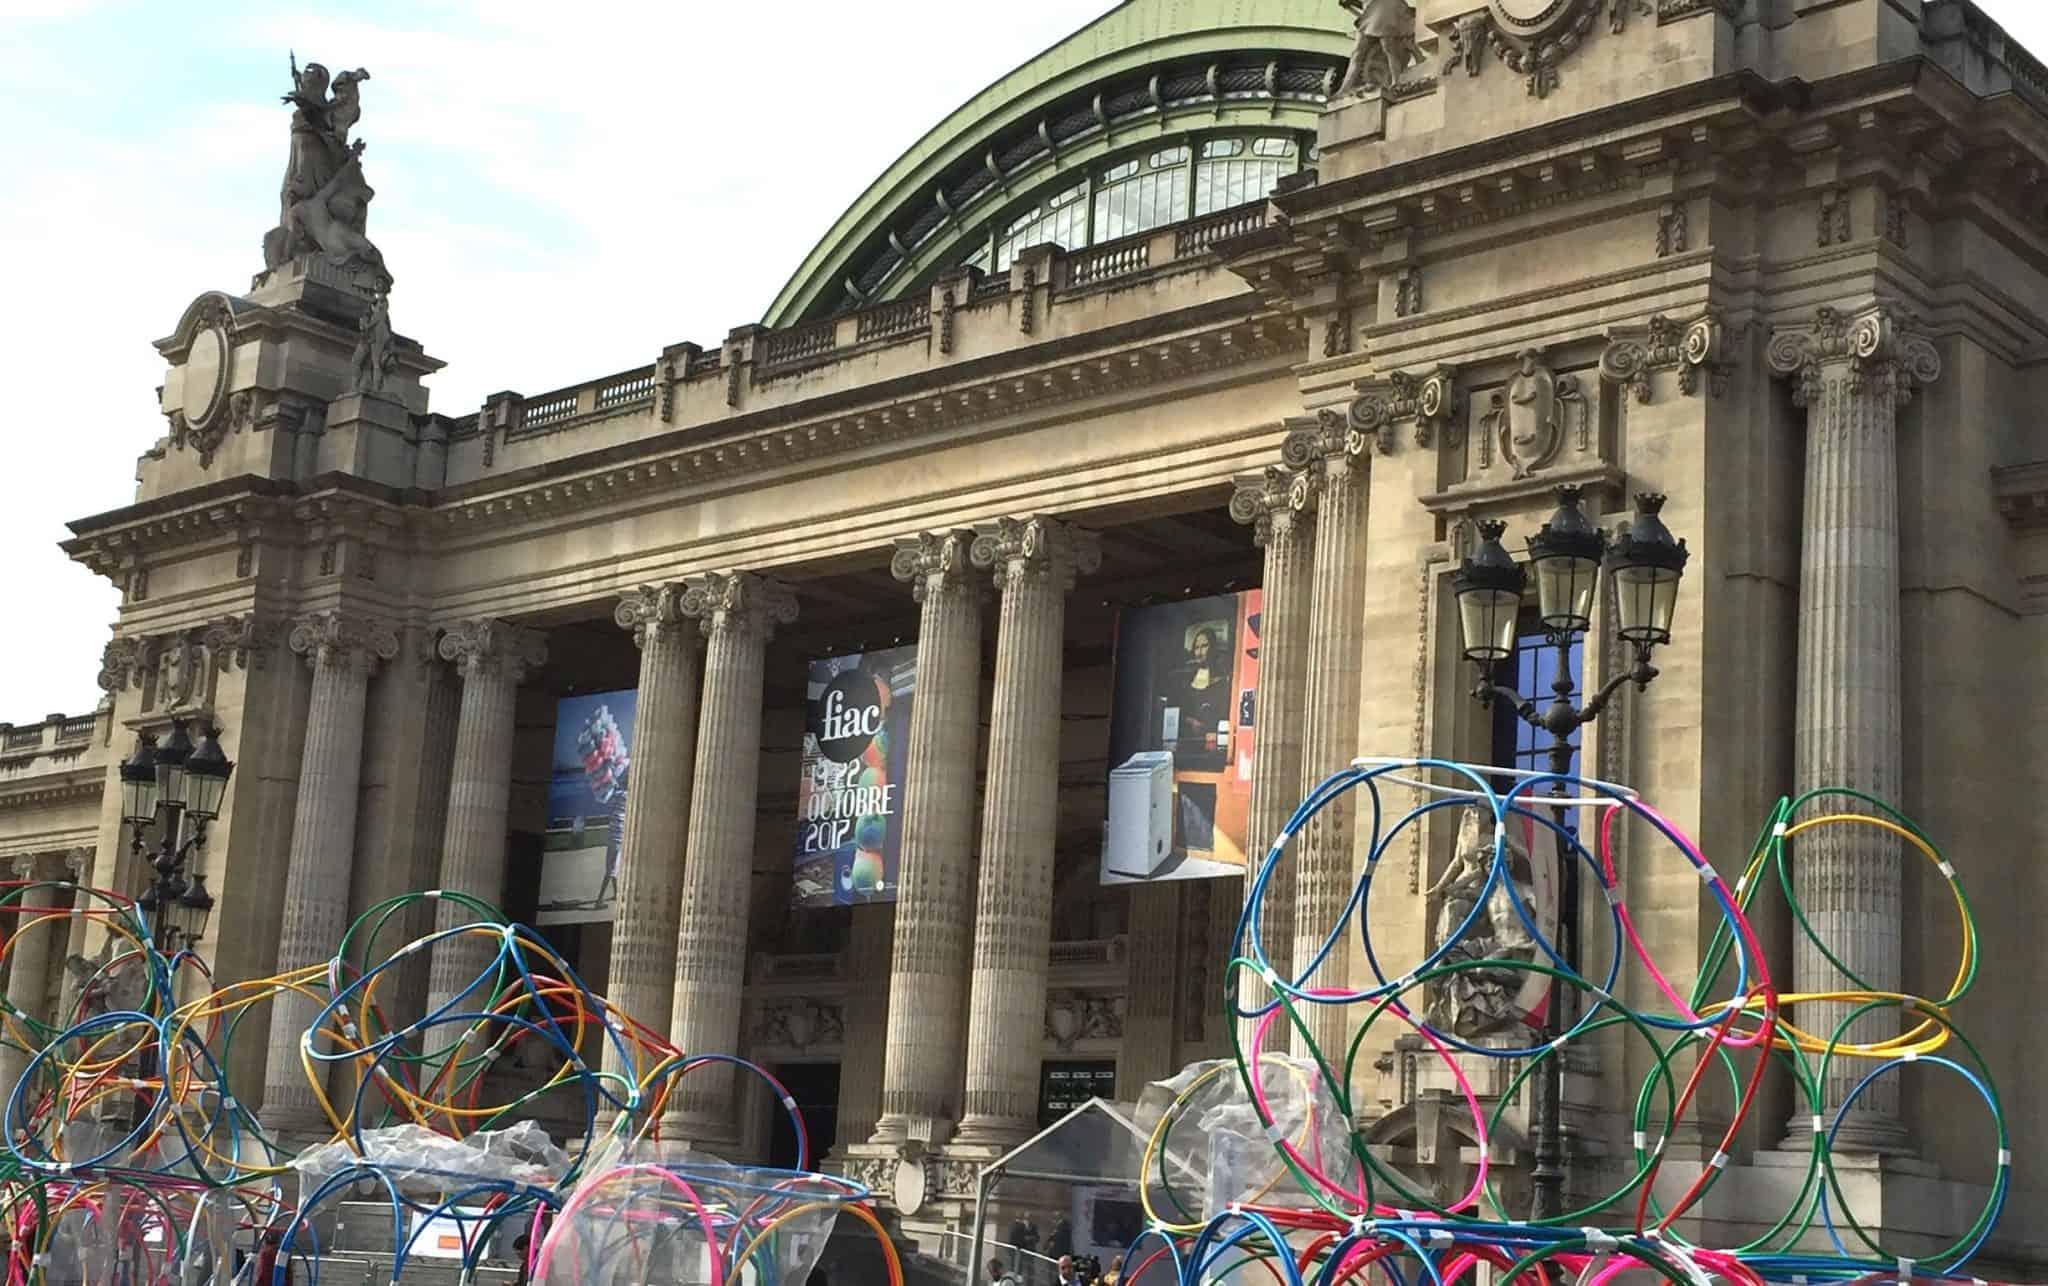 vente d'art contemporain semaine de la FIAC 2017